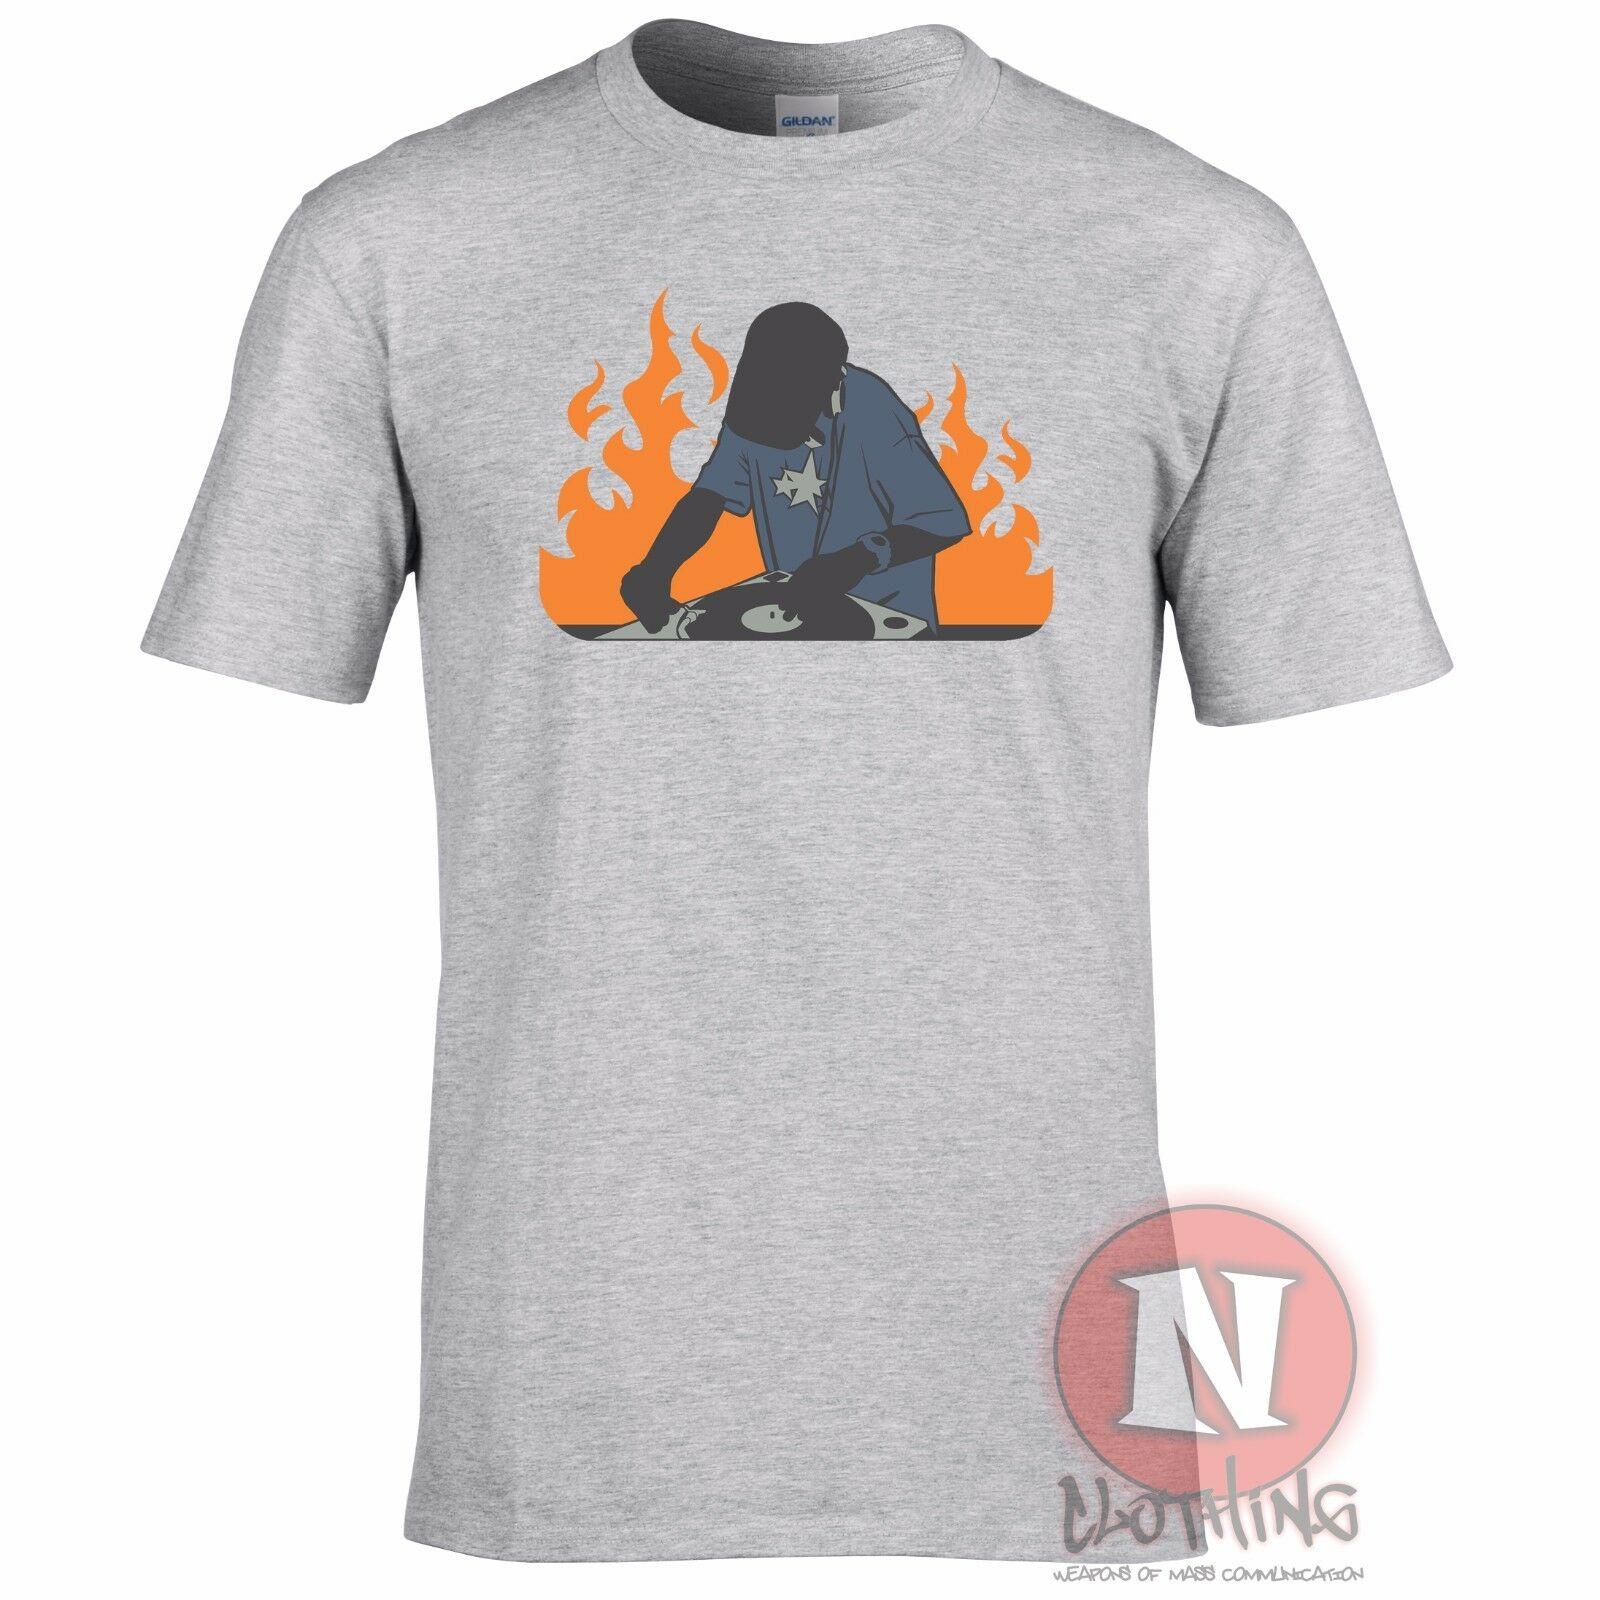 DJ On Fire Tshirt Turntable Rave Clubbing Deejay Ibiza Old School Style T Shirt Men Women Tee Shirt Fashion Large Big Size